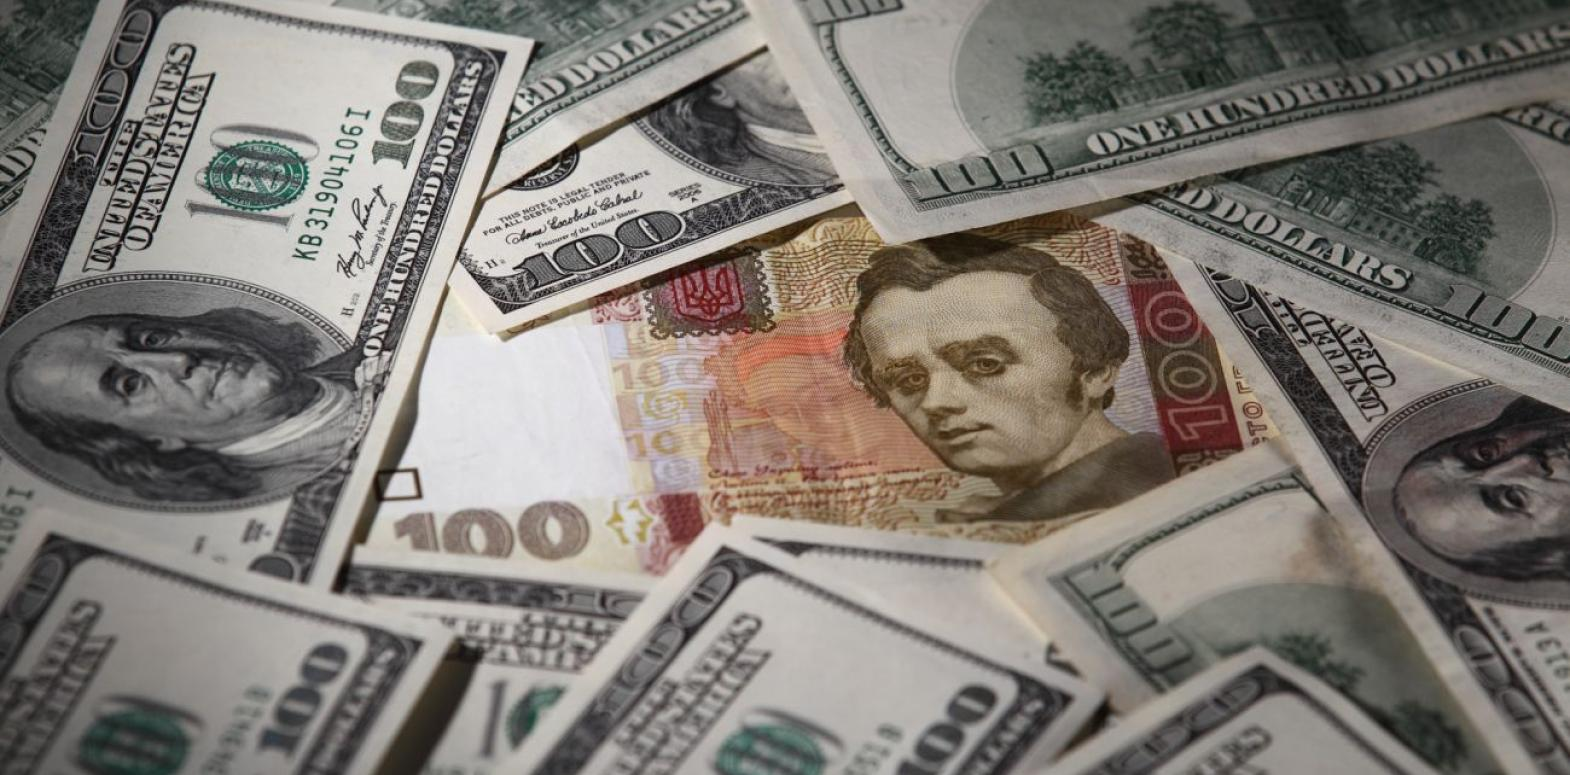 Курс доллара на межбанке поднялся до уровня 28 гривен